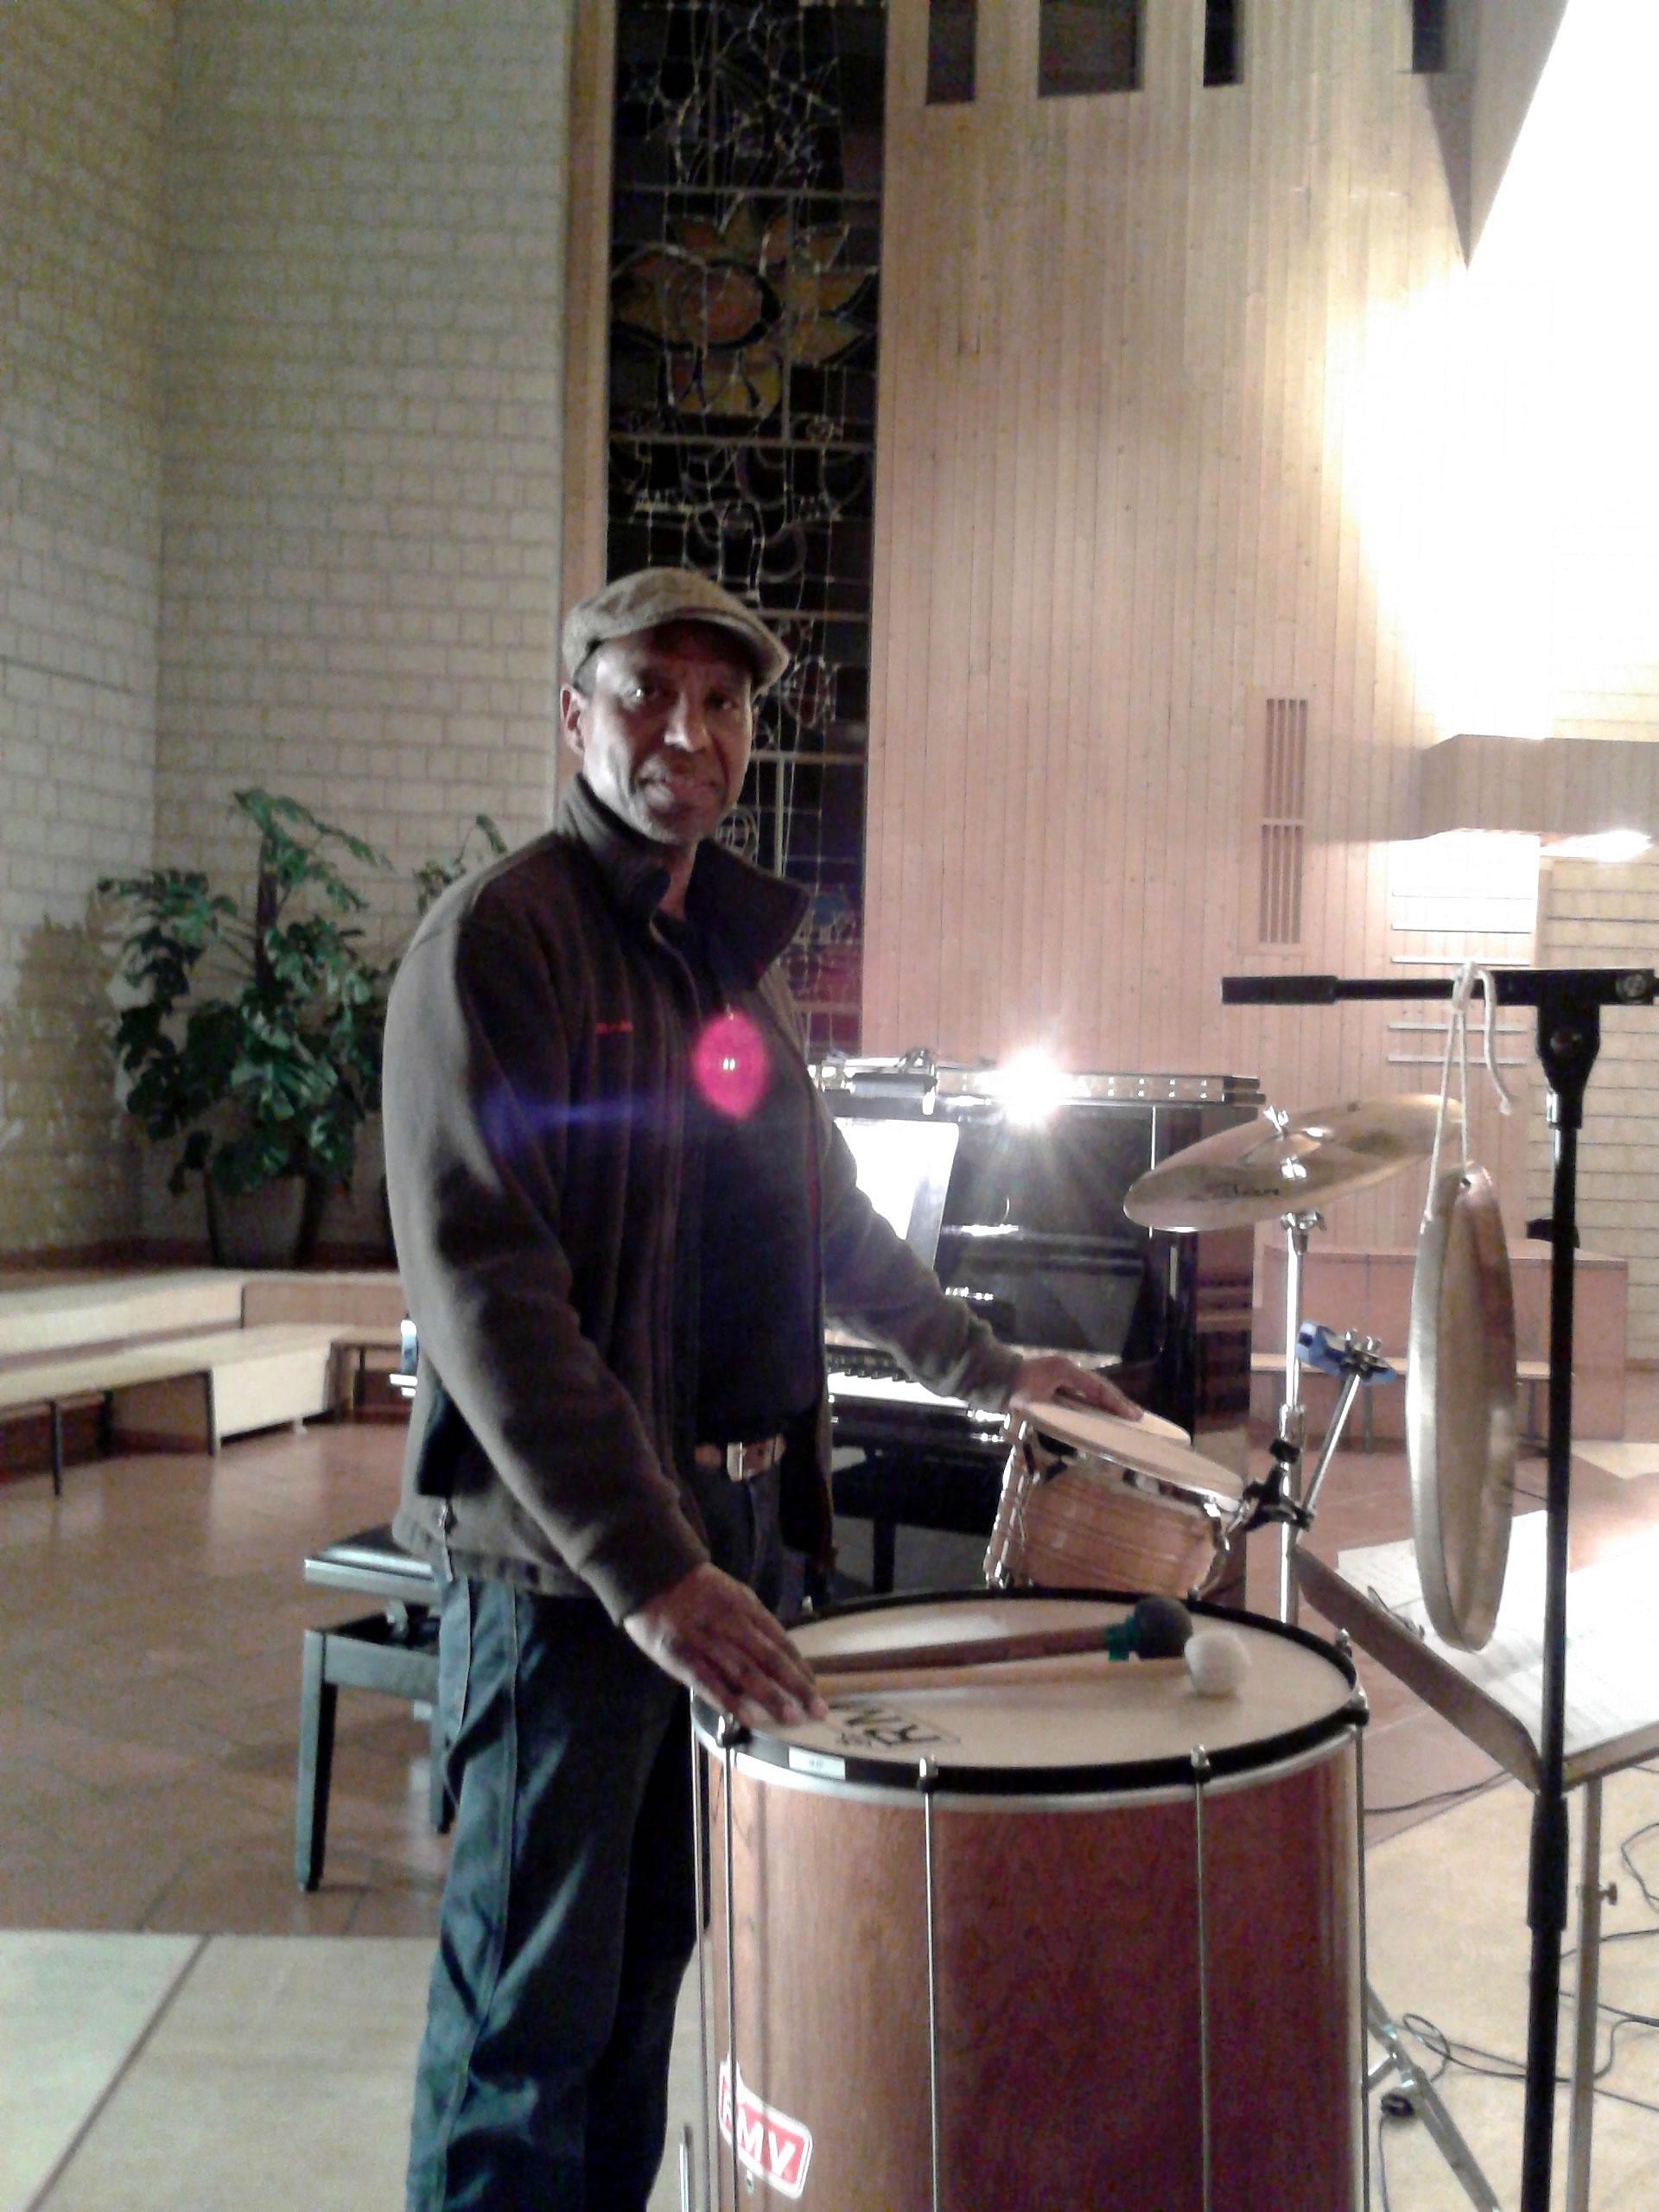 Mark Brazil in church